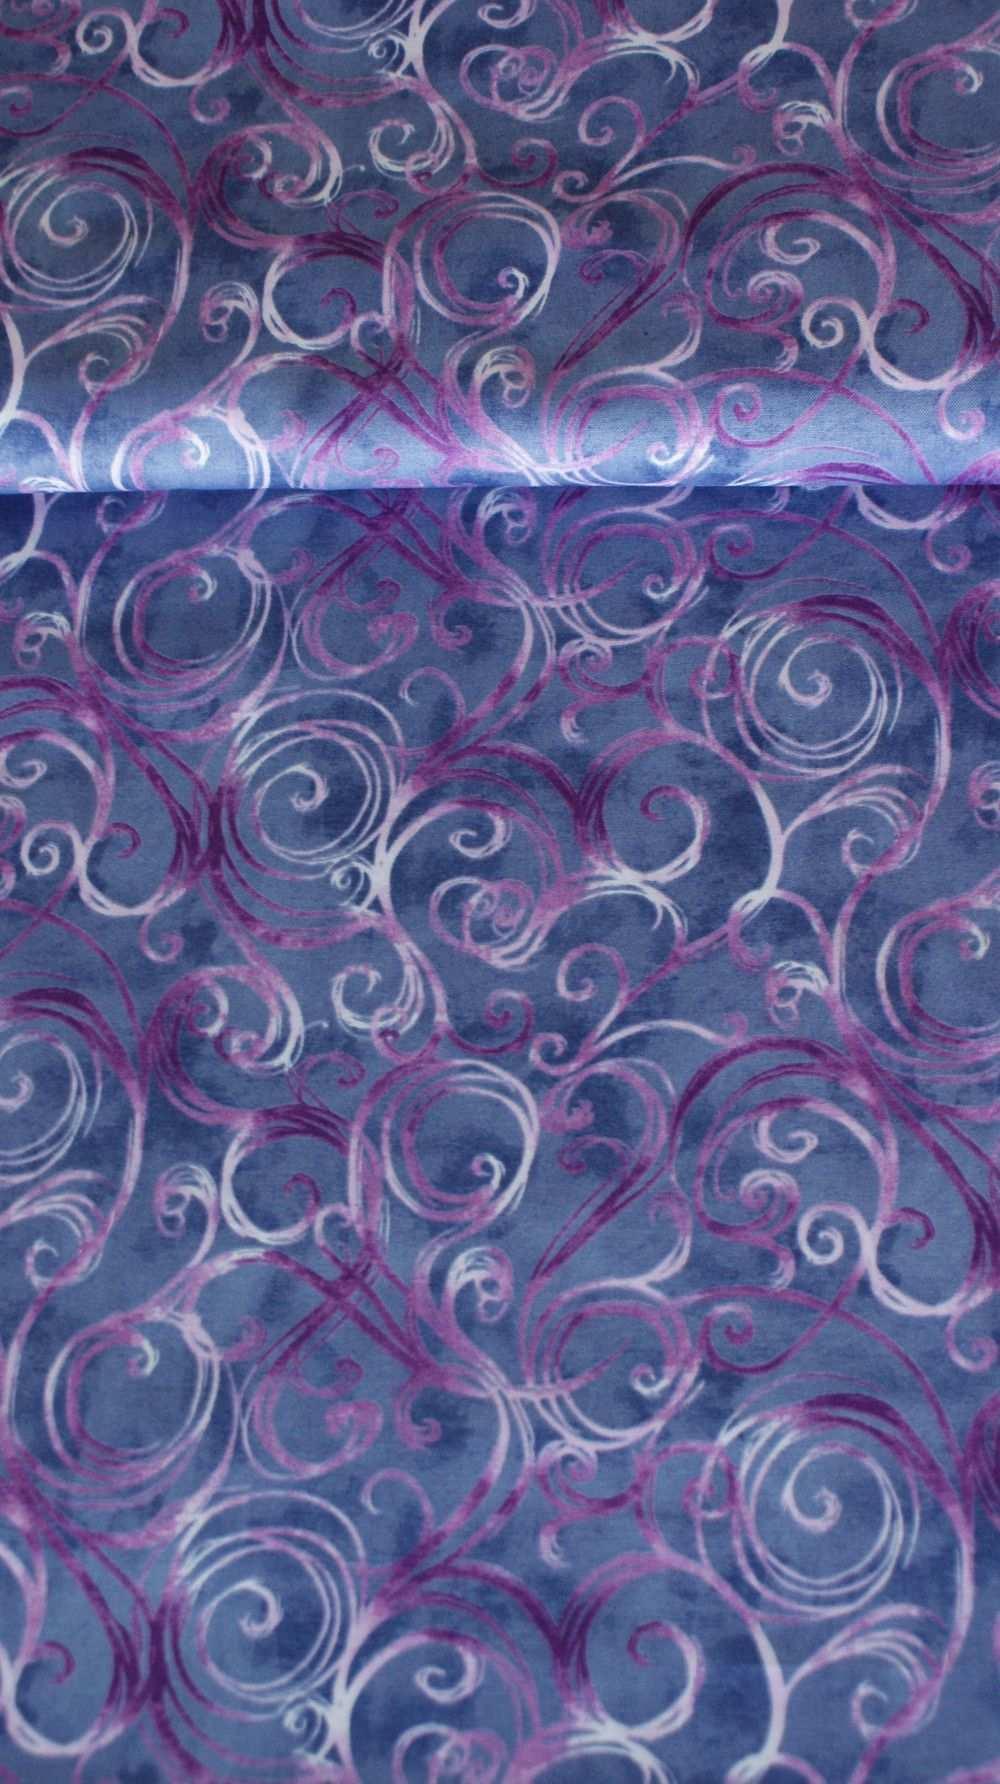 Baumwollstoff Mit Ornamenten Swirls In Lila Grafische Muster Lila Baumwolle